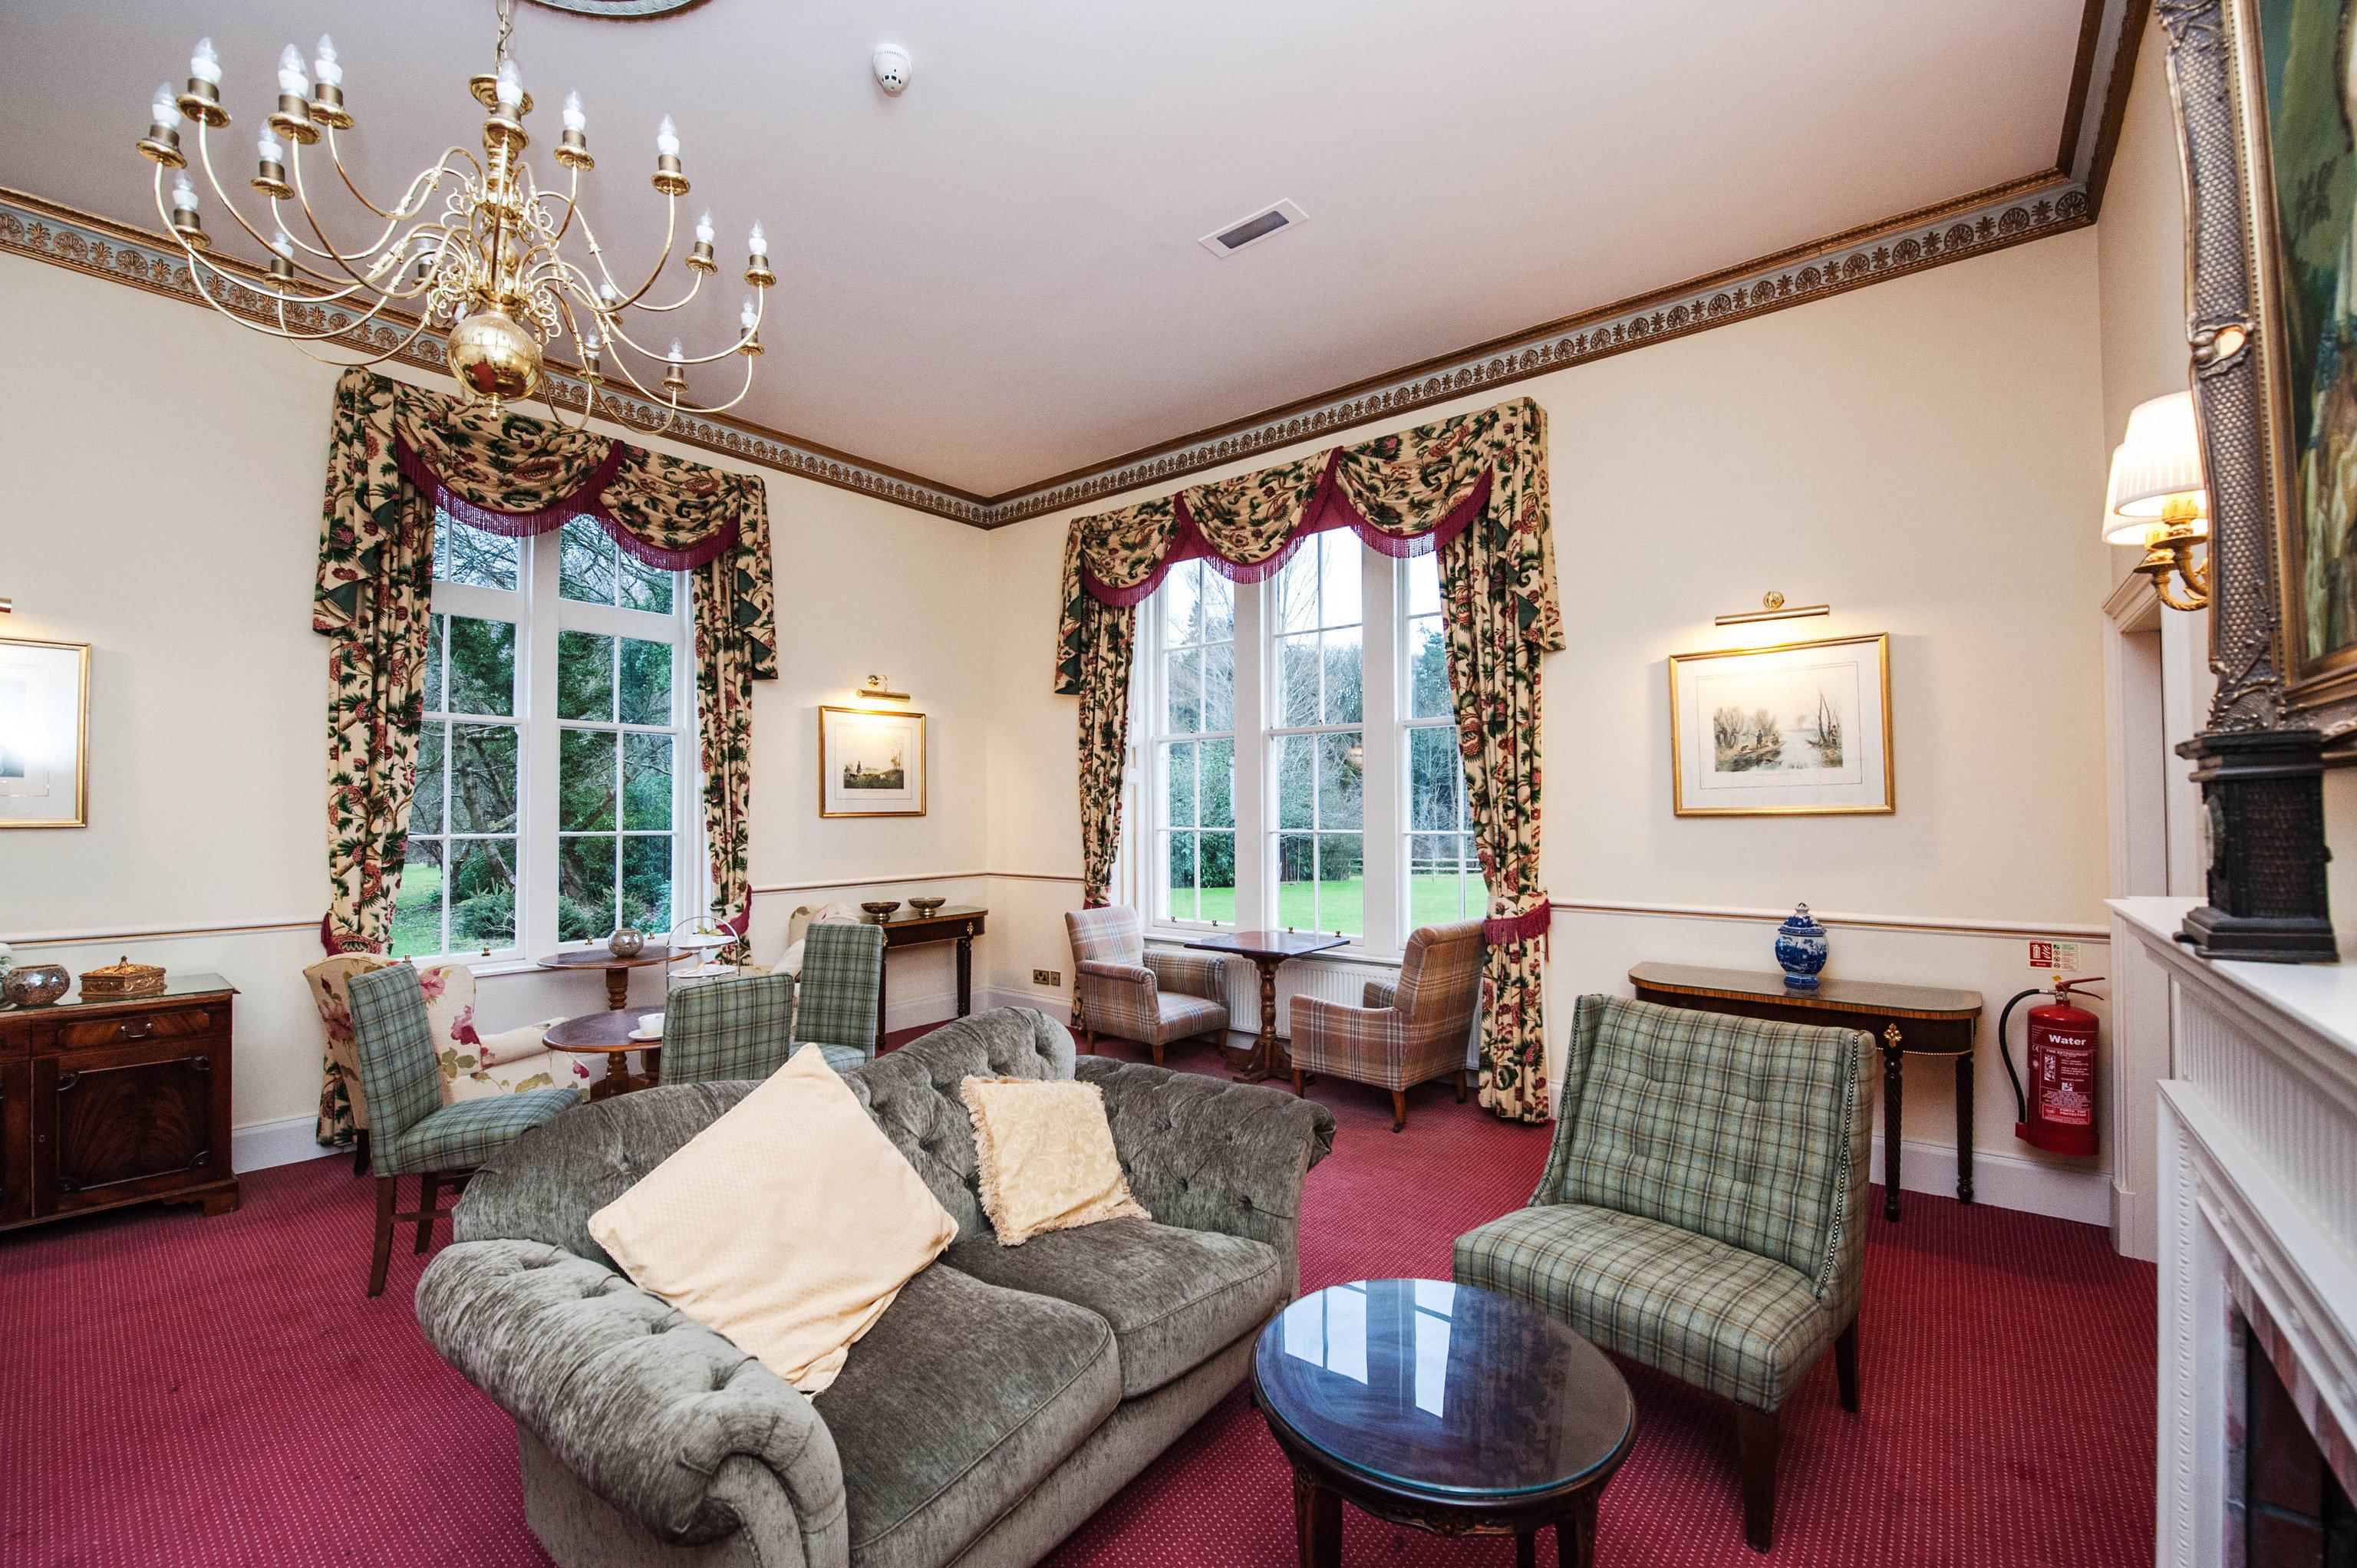 sofa living room property home mansion cottage Suite Villa condominium Bedroom